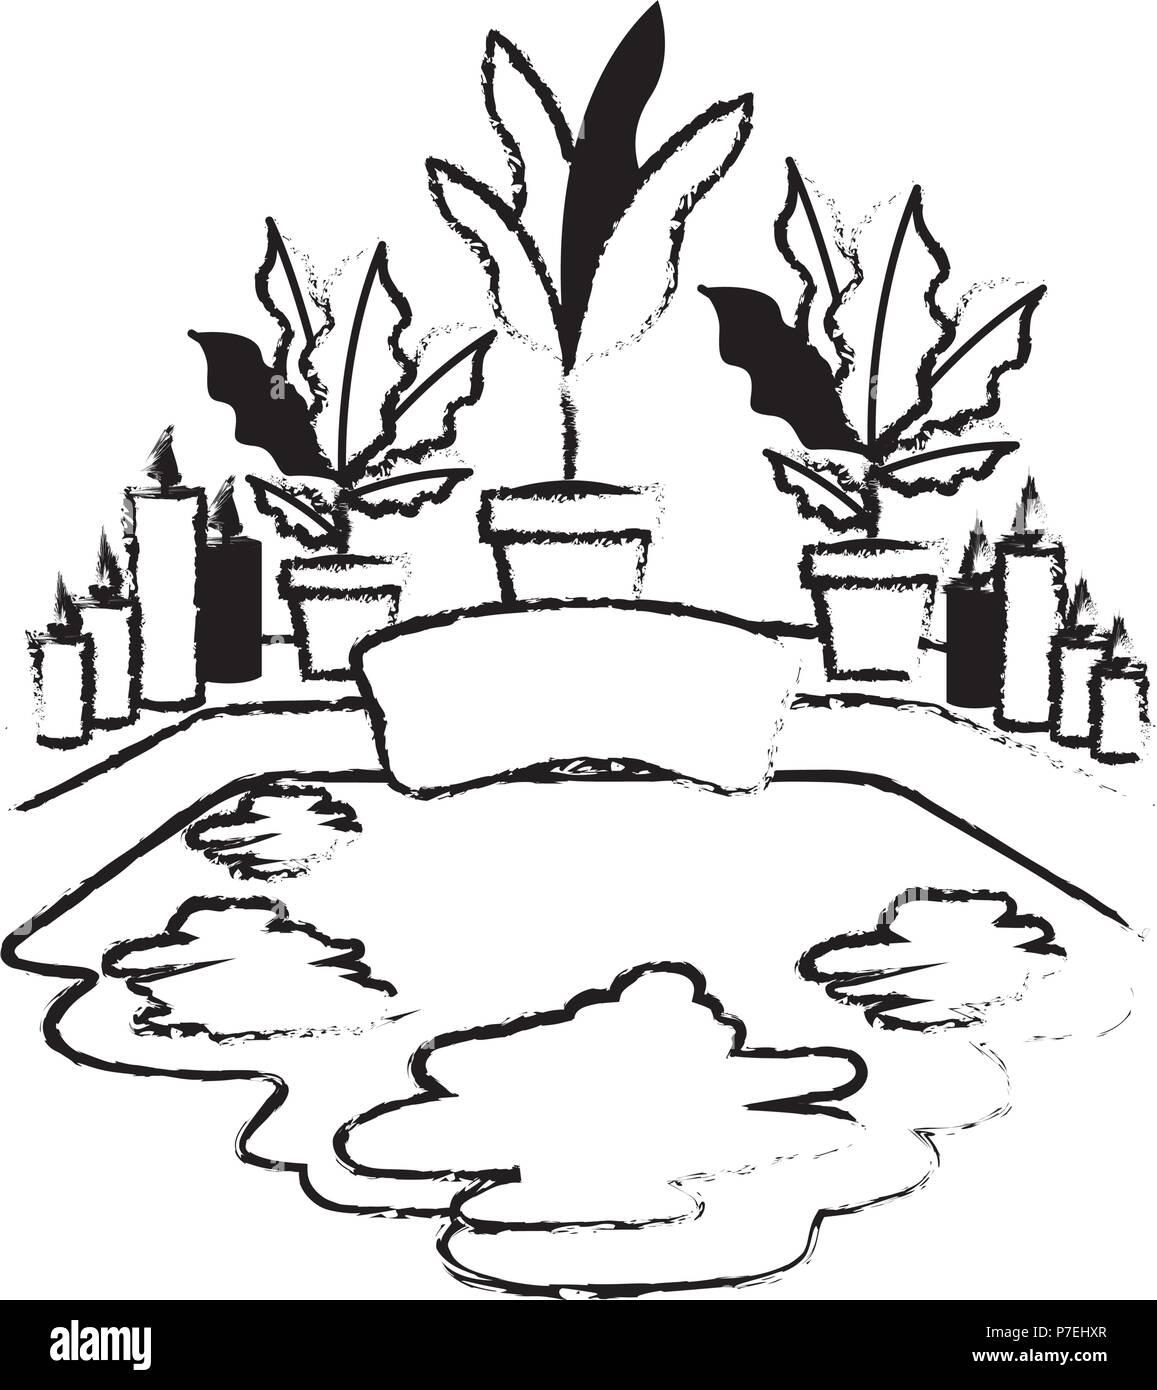 bathtub with houseplants scene - Stock Vector